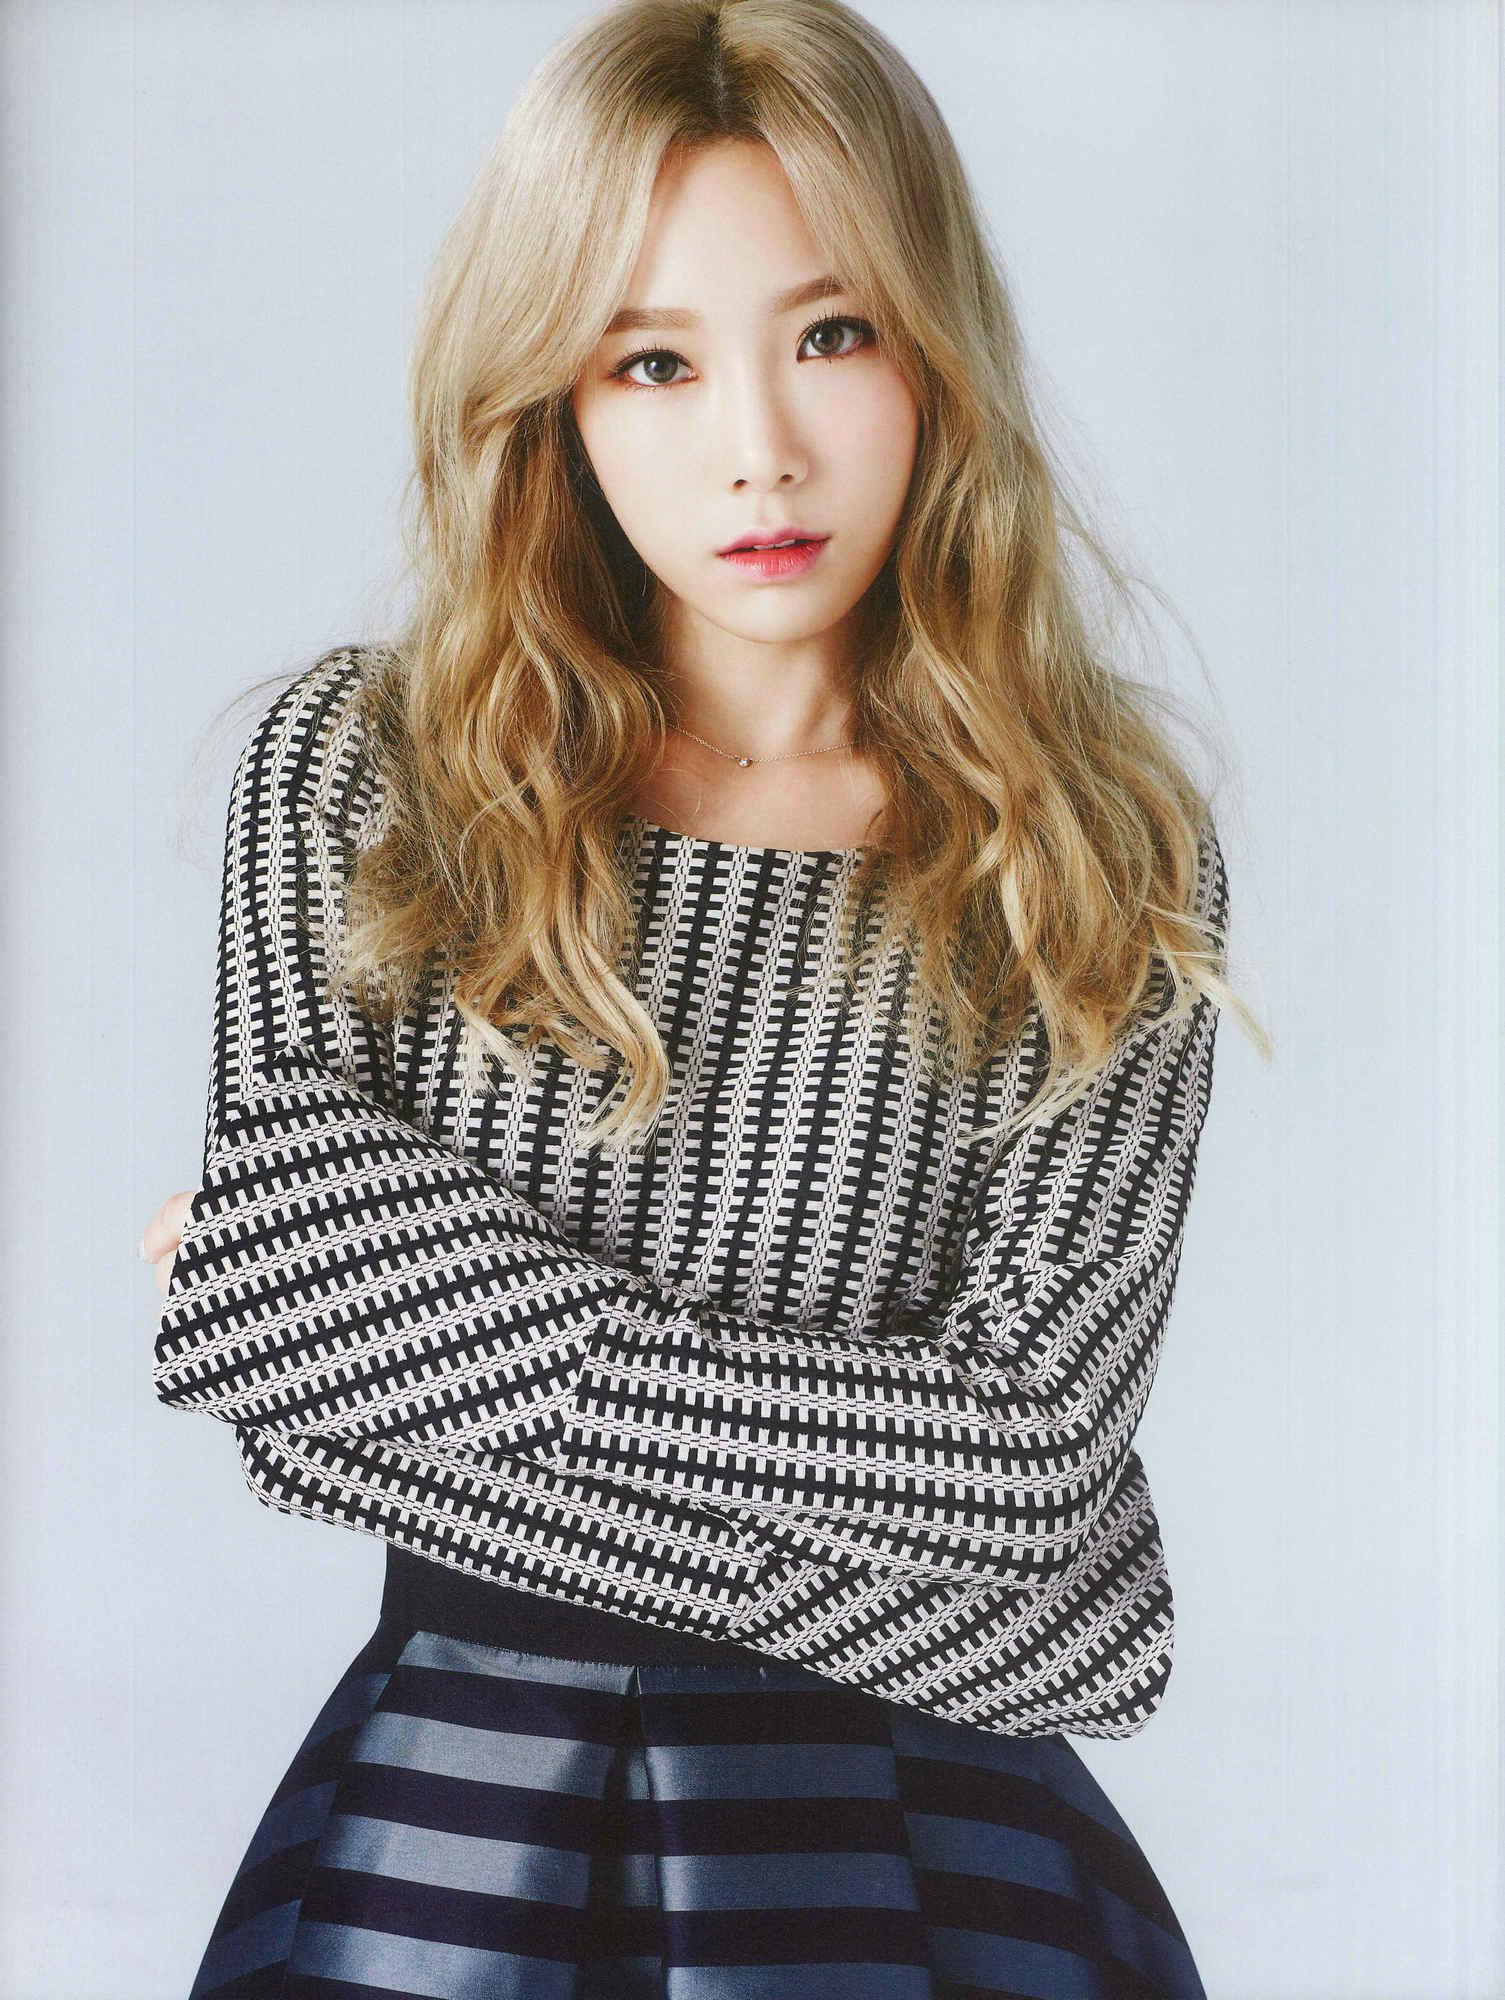 Nice wallpapers Taeyeon 1505x2000px